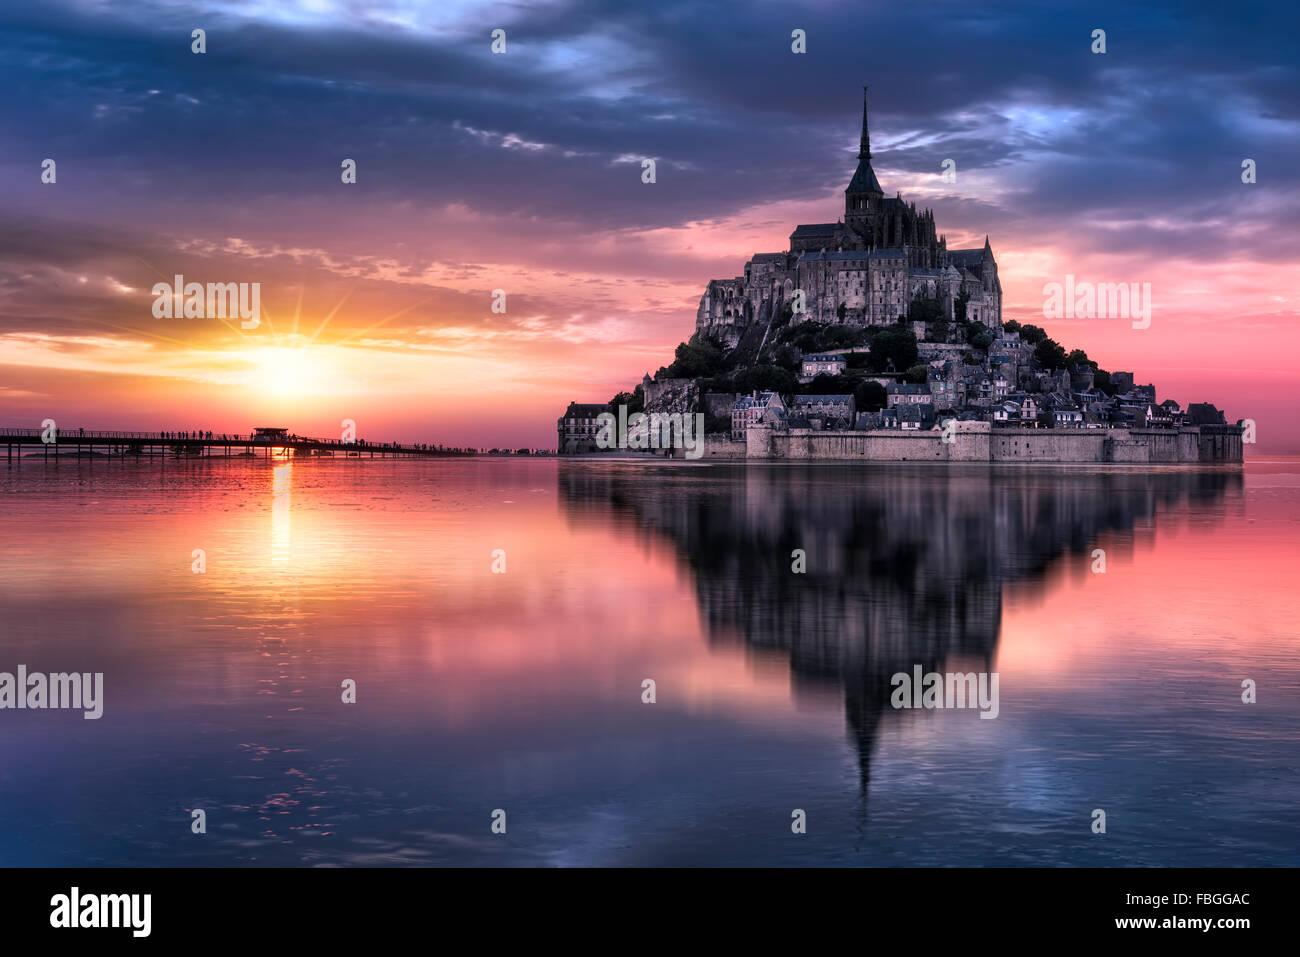 Le Mont Saint-Michel bei Sonnenuntergang, Normandie, Bretagne, Frankreich, Europa Stockfoto